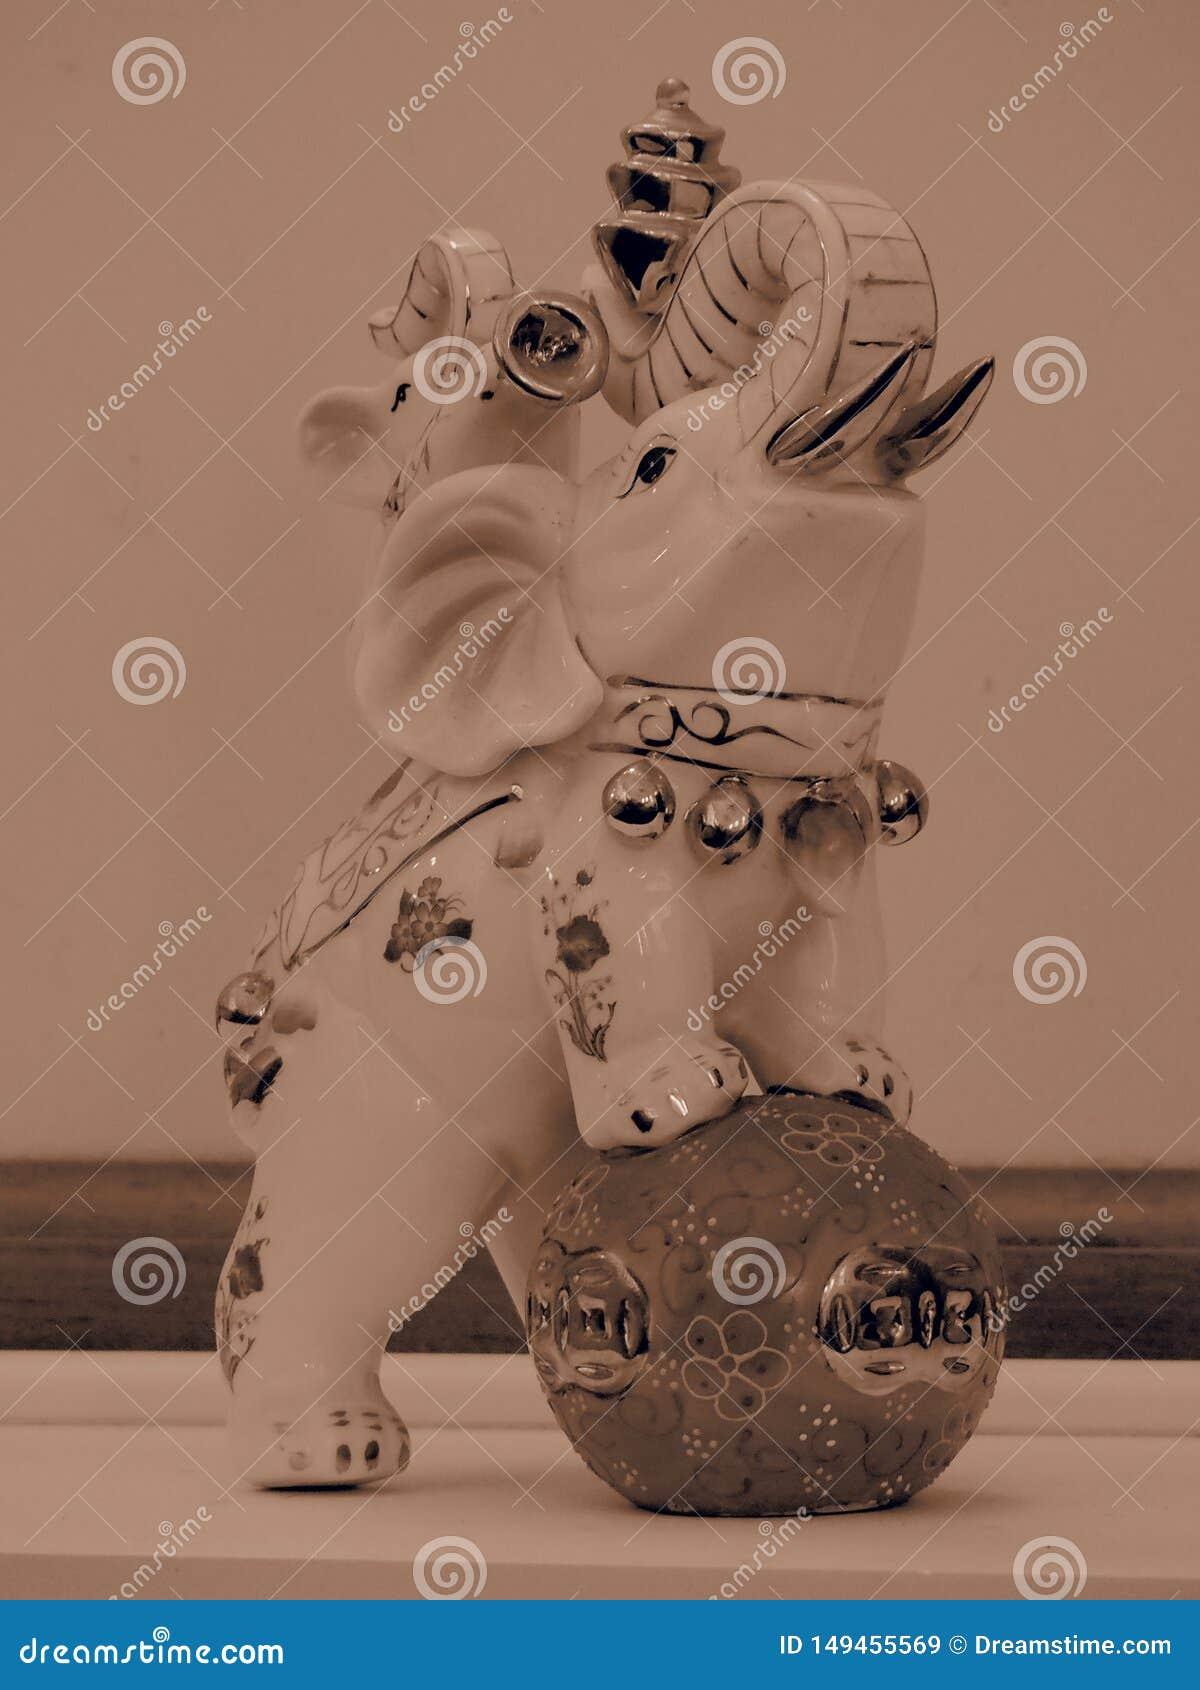 Elephant Figurine with Sepia filter